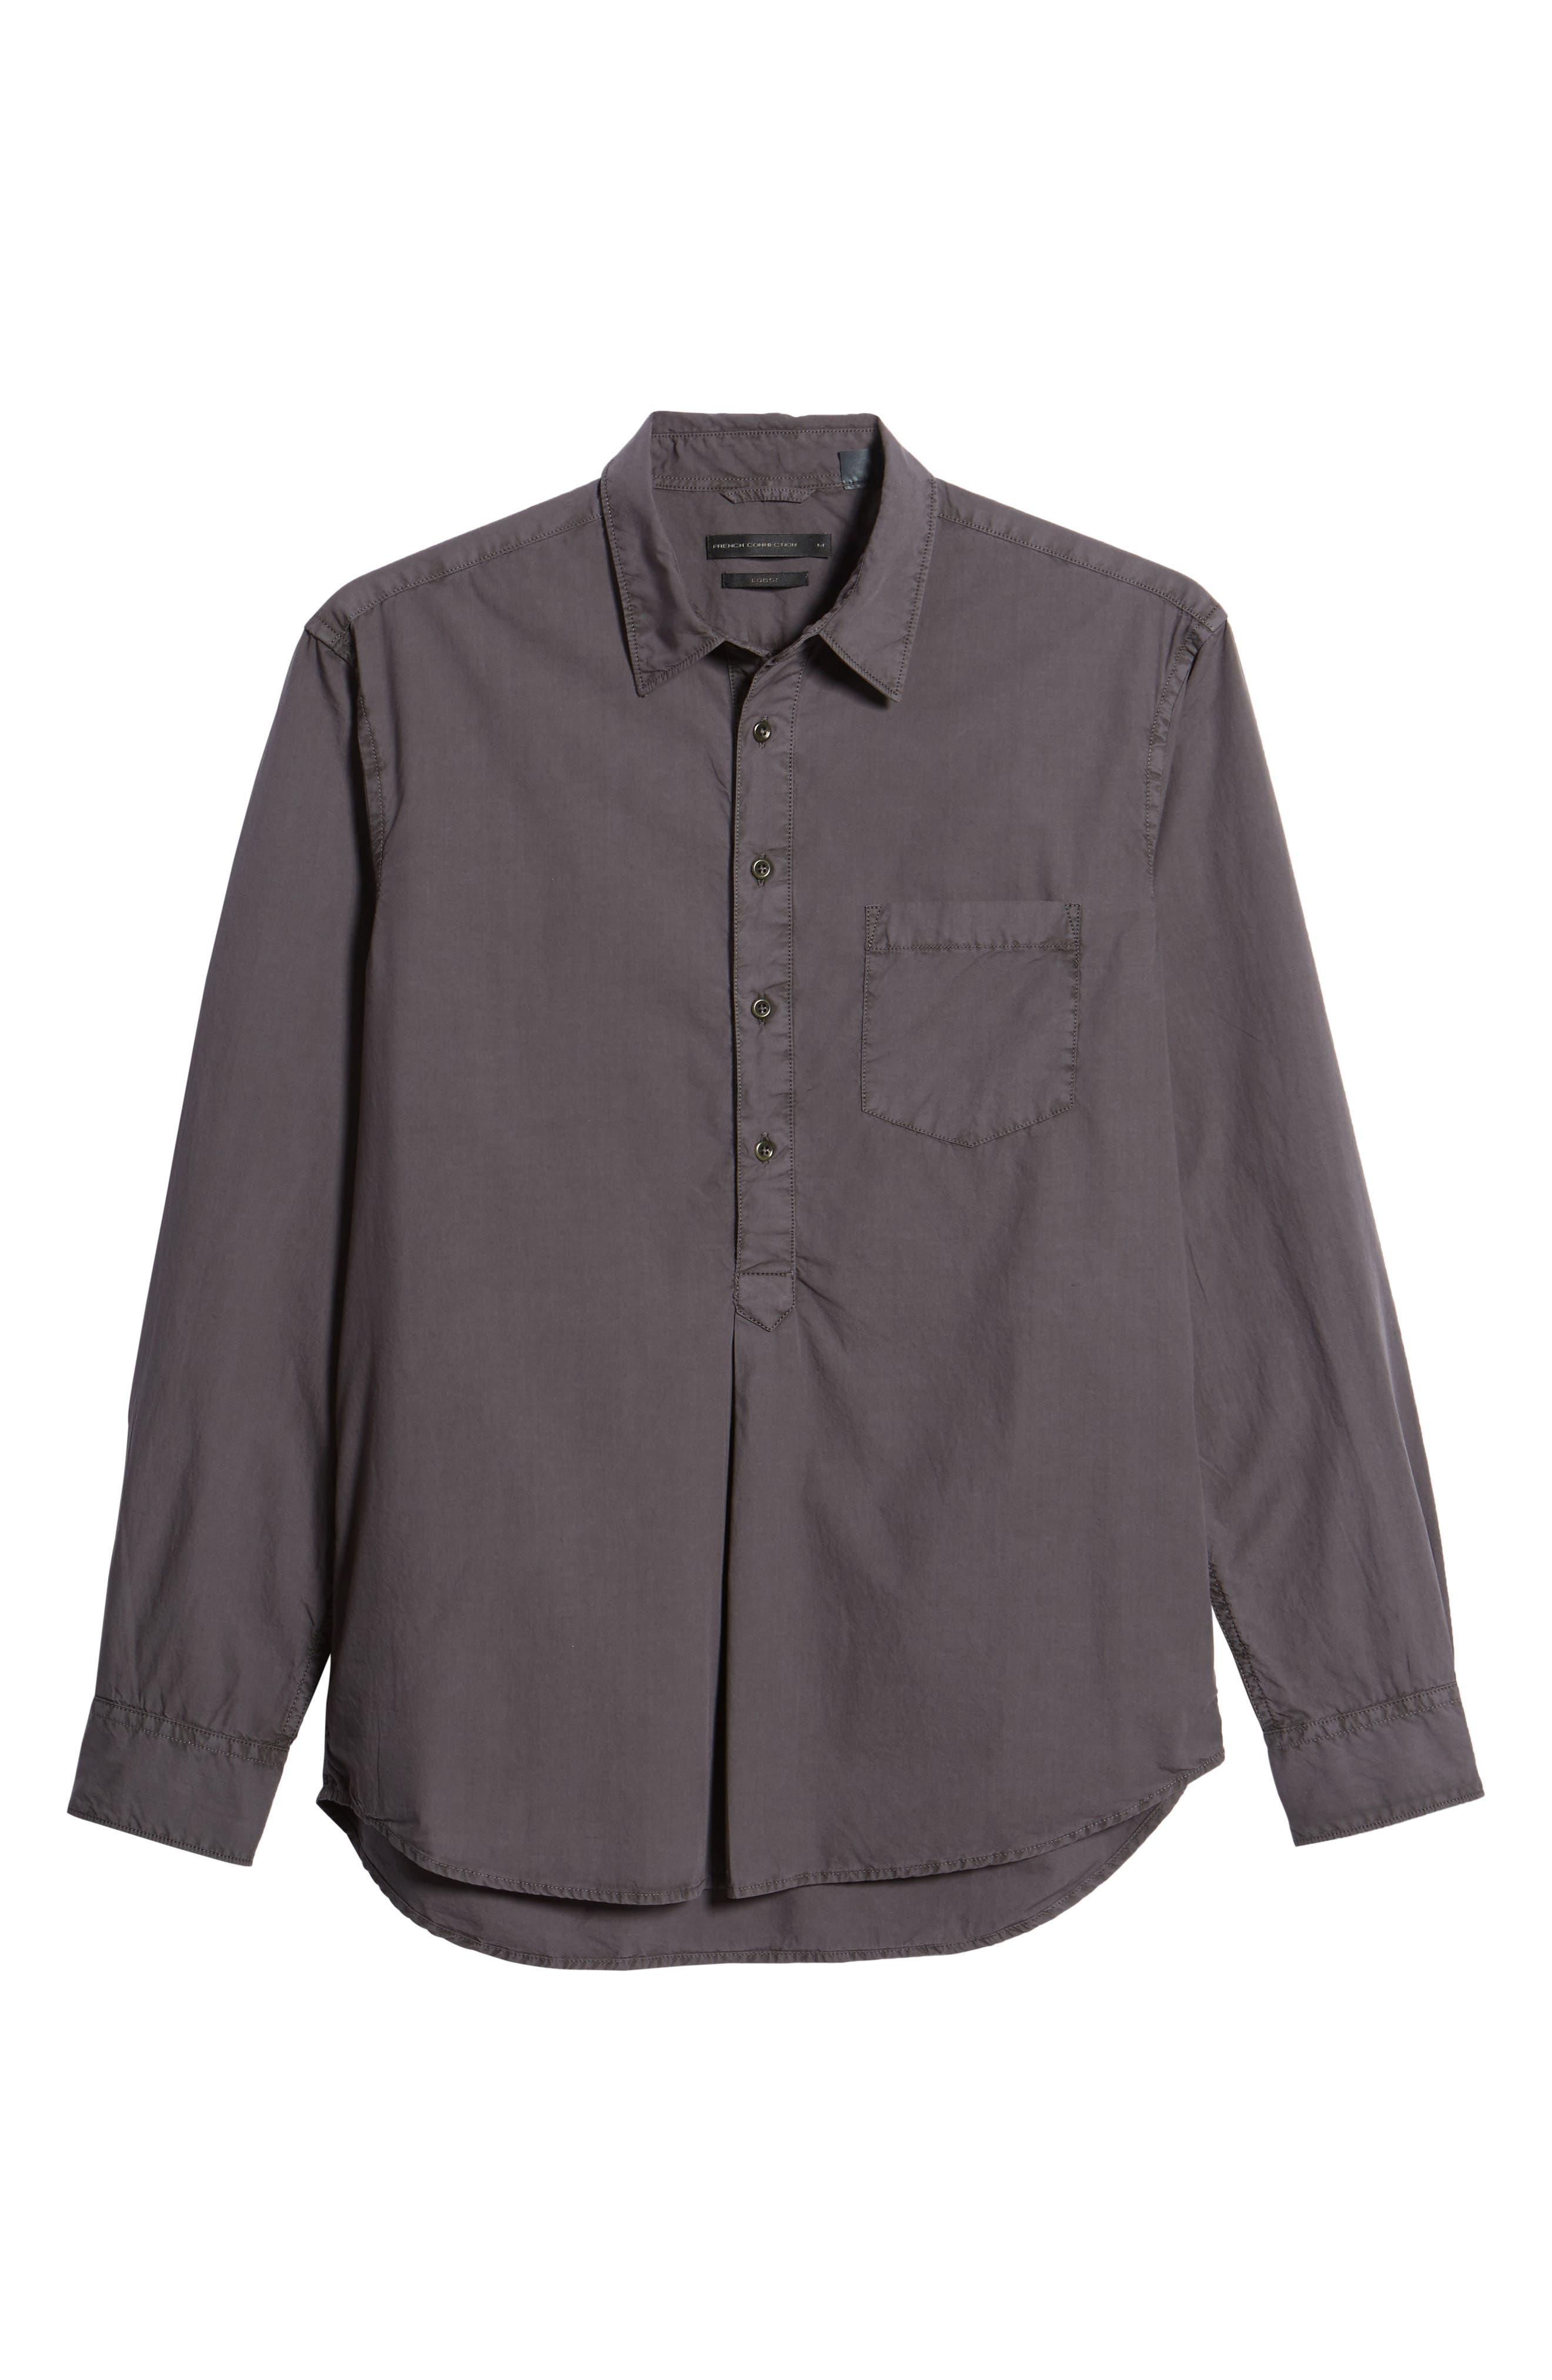 Regular Fit Garment Dyed Poplin Sport Shirt,                             Alternate thumbnail 6, color,                             020